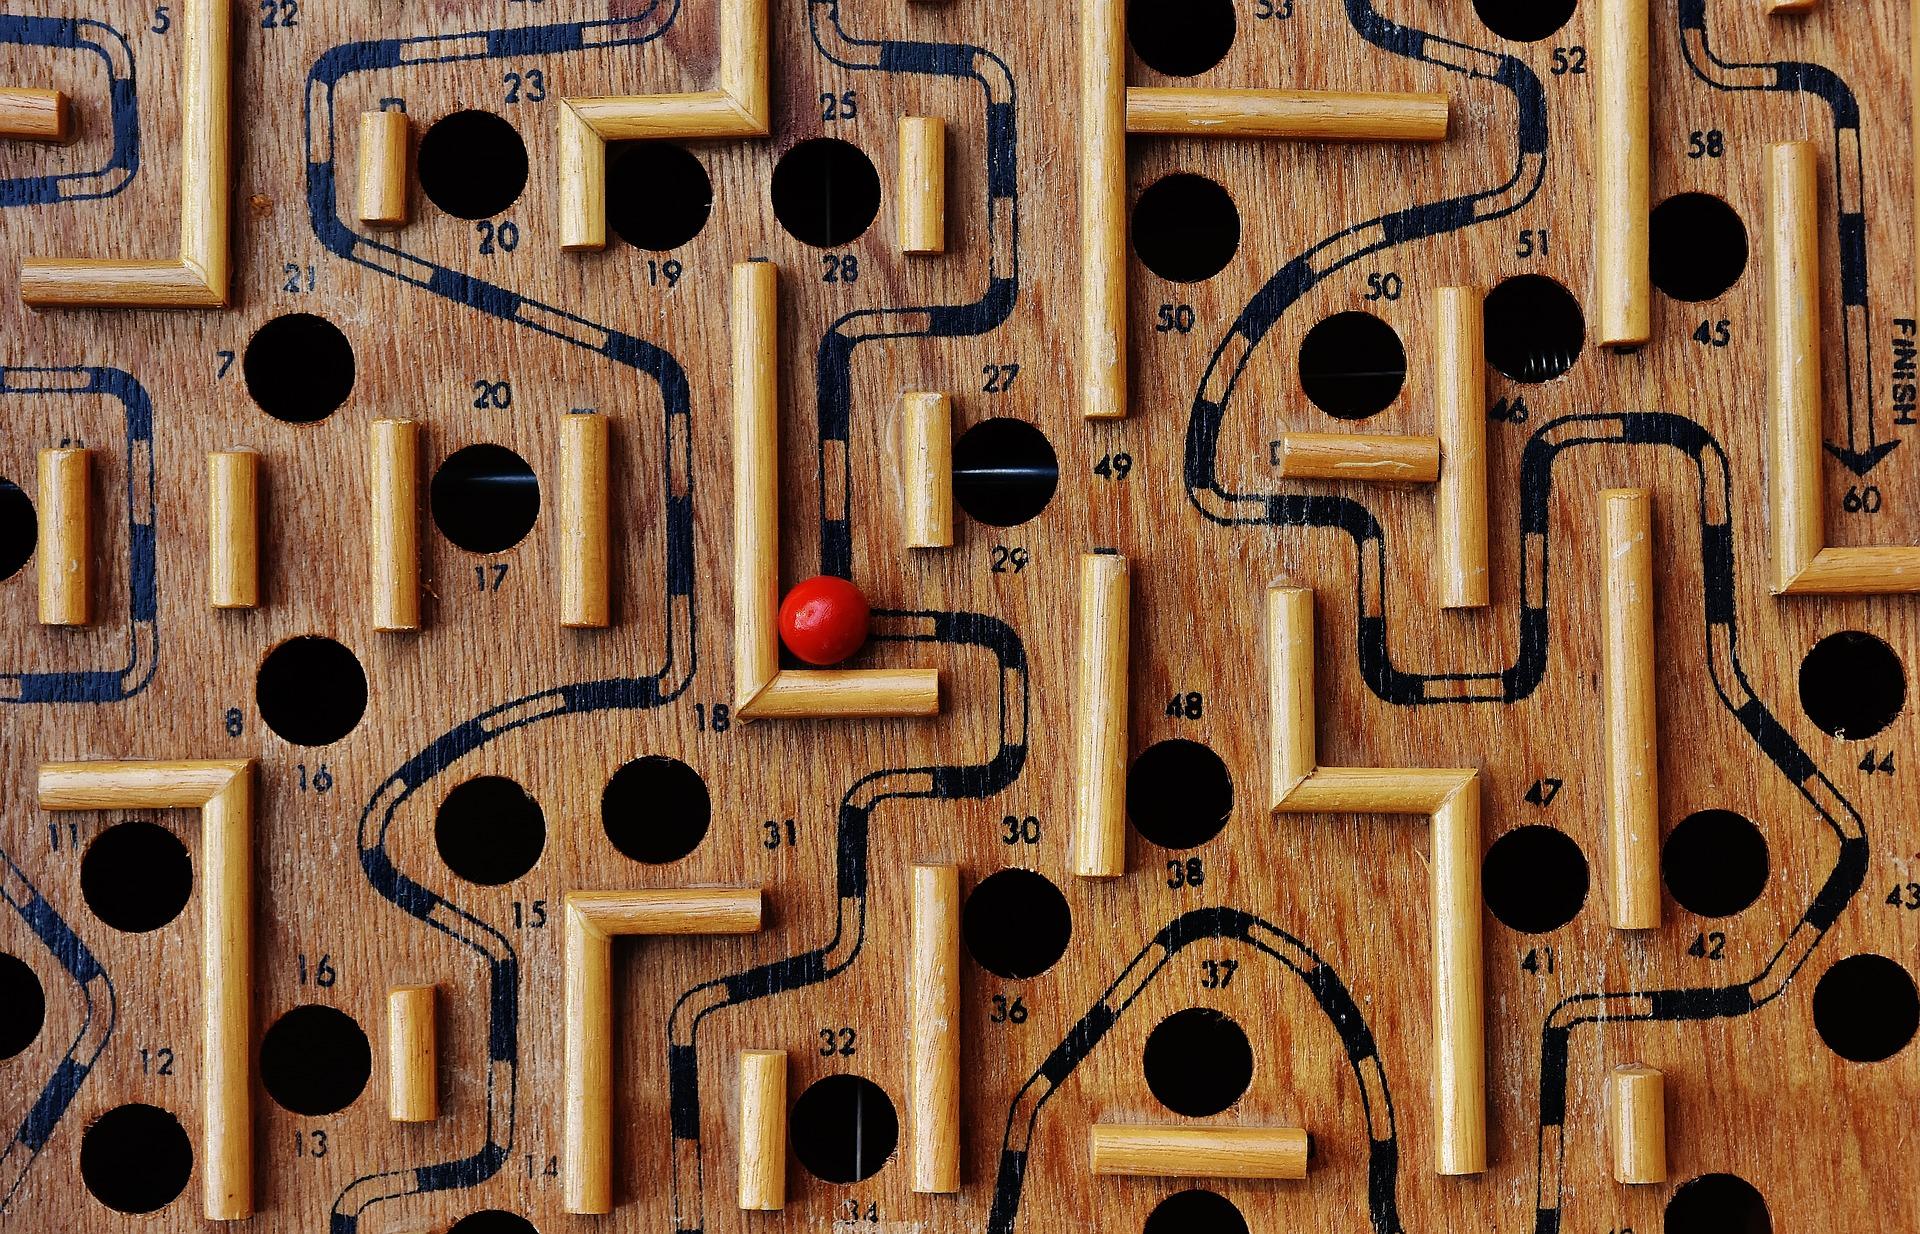 labyrinth-1738039_1920.jpg